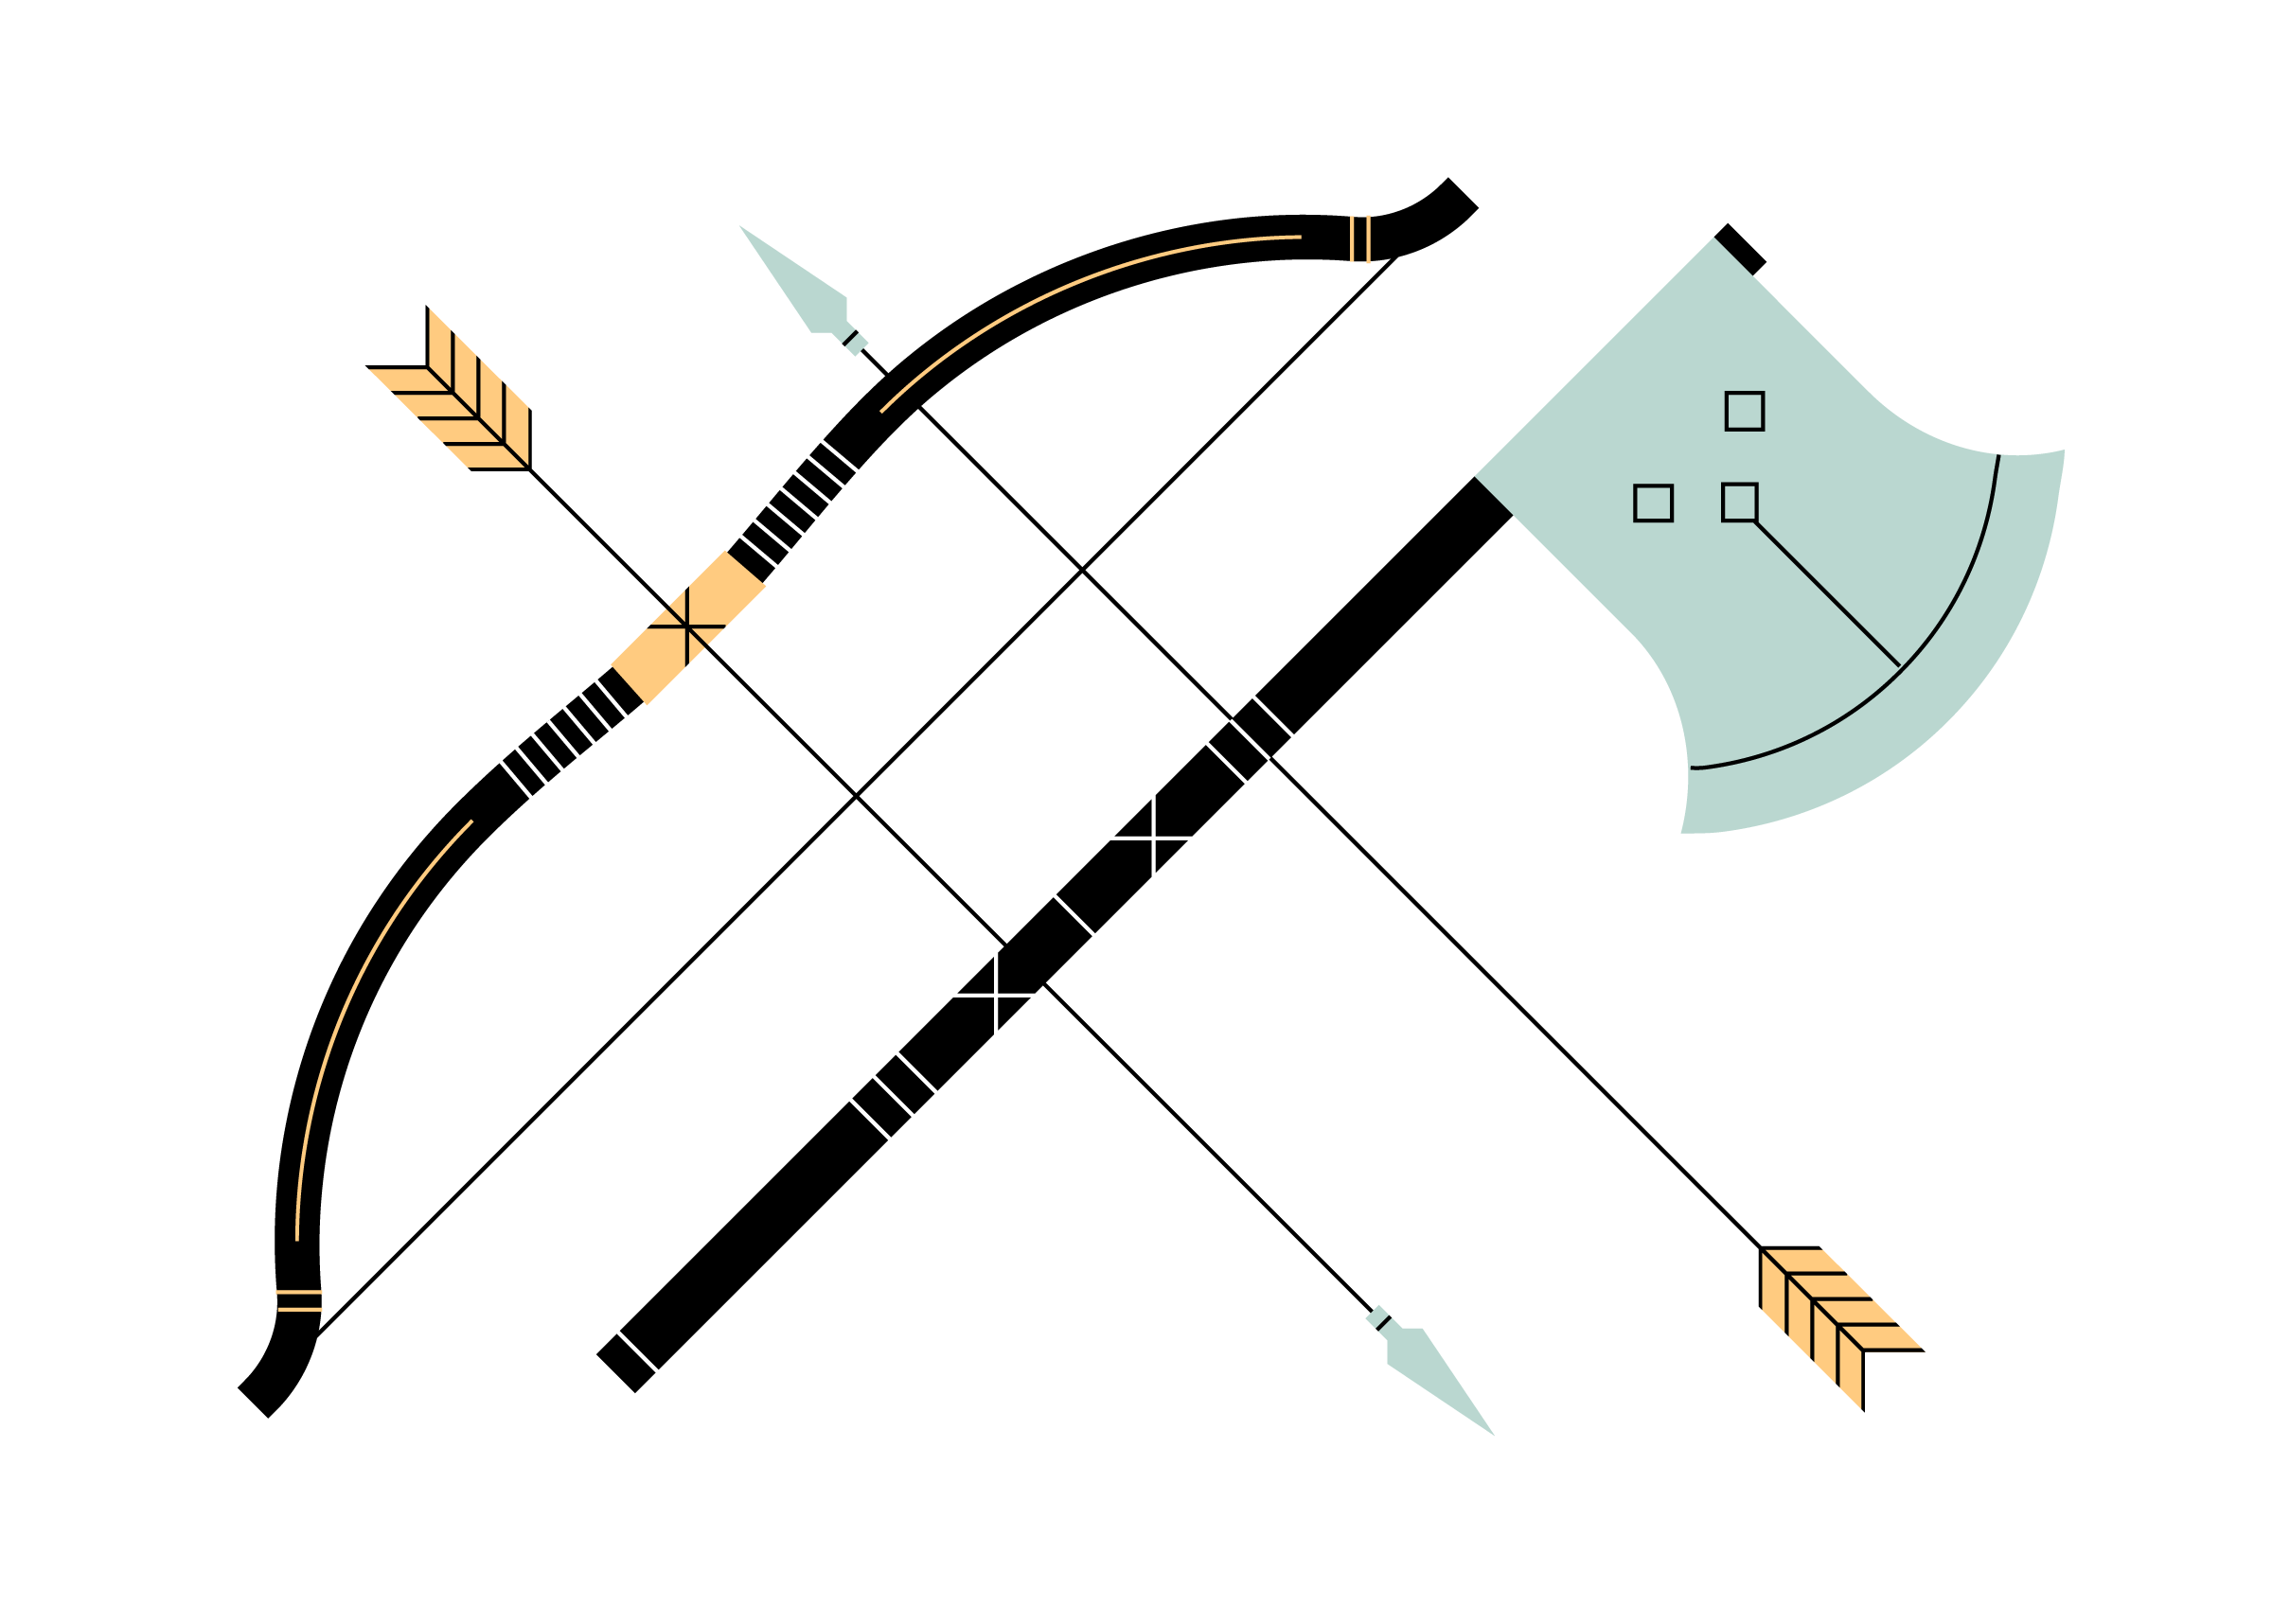 aleksandar-savic_cps_infographic-slavic-migrations2